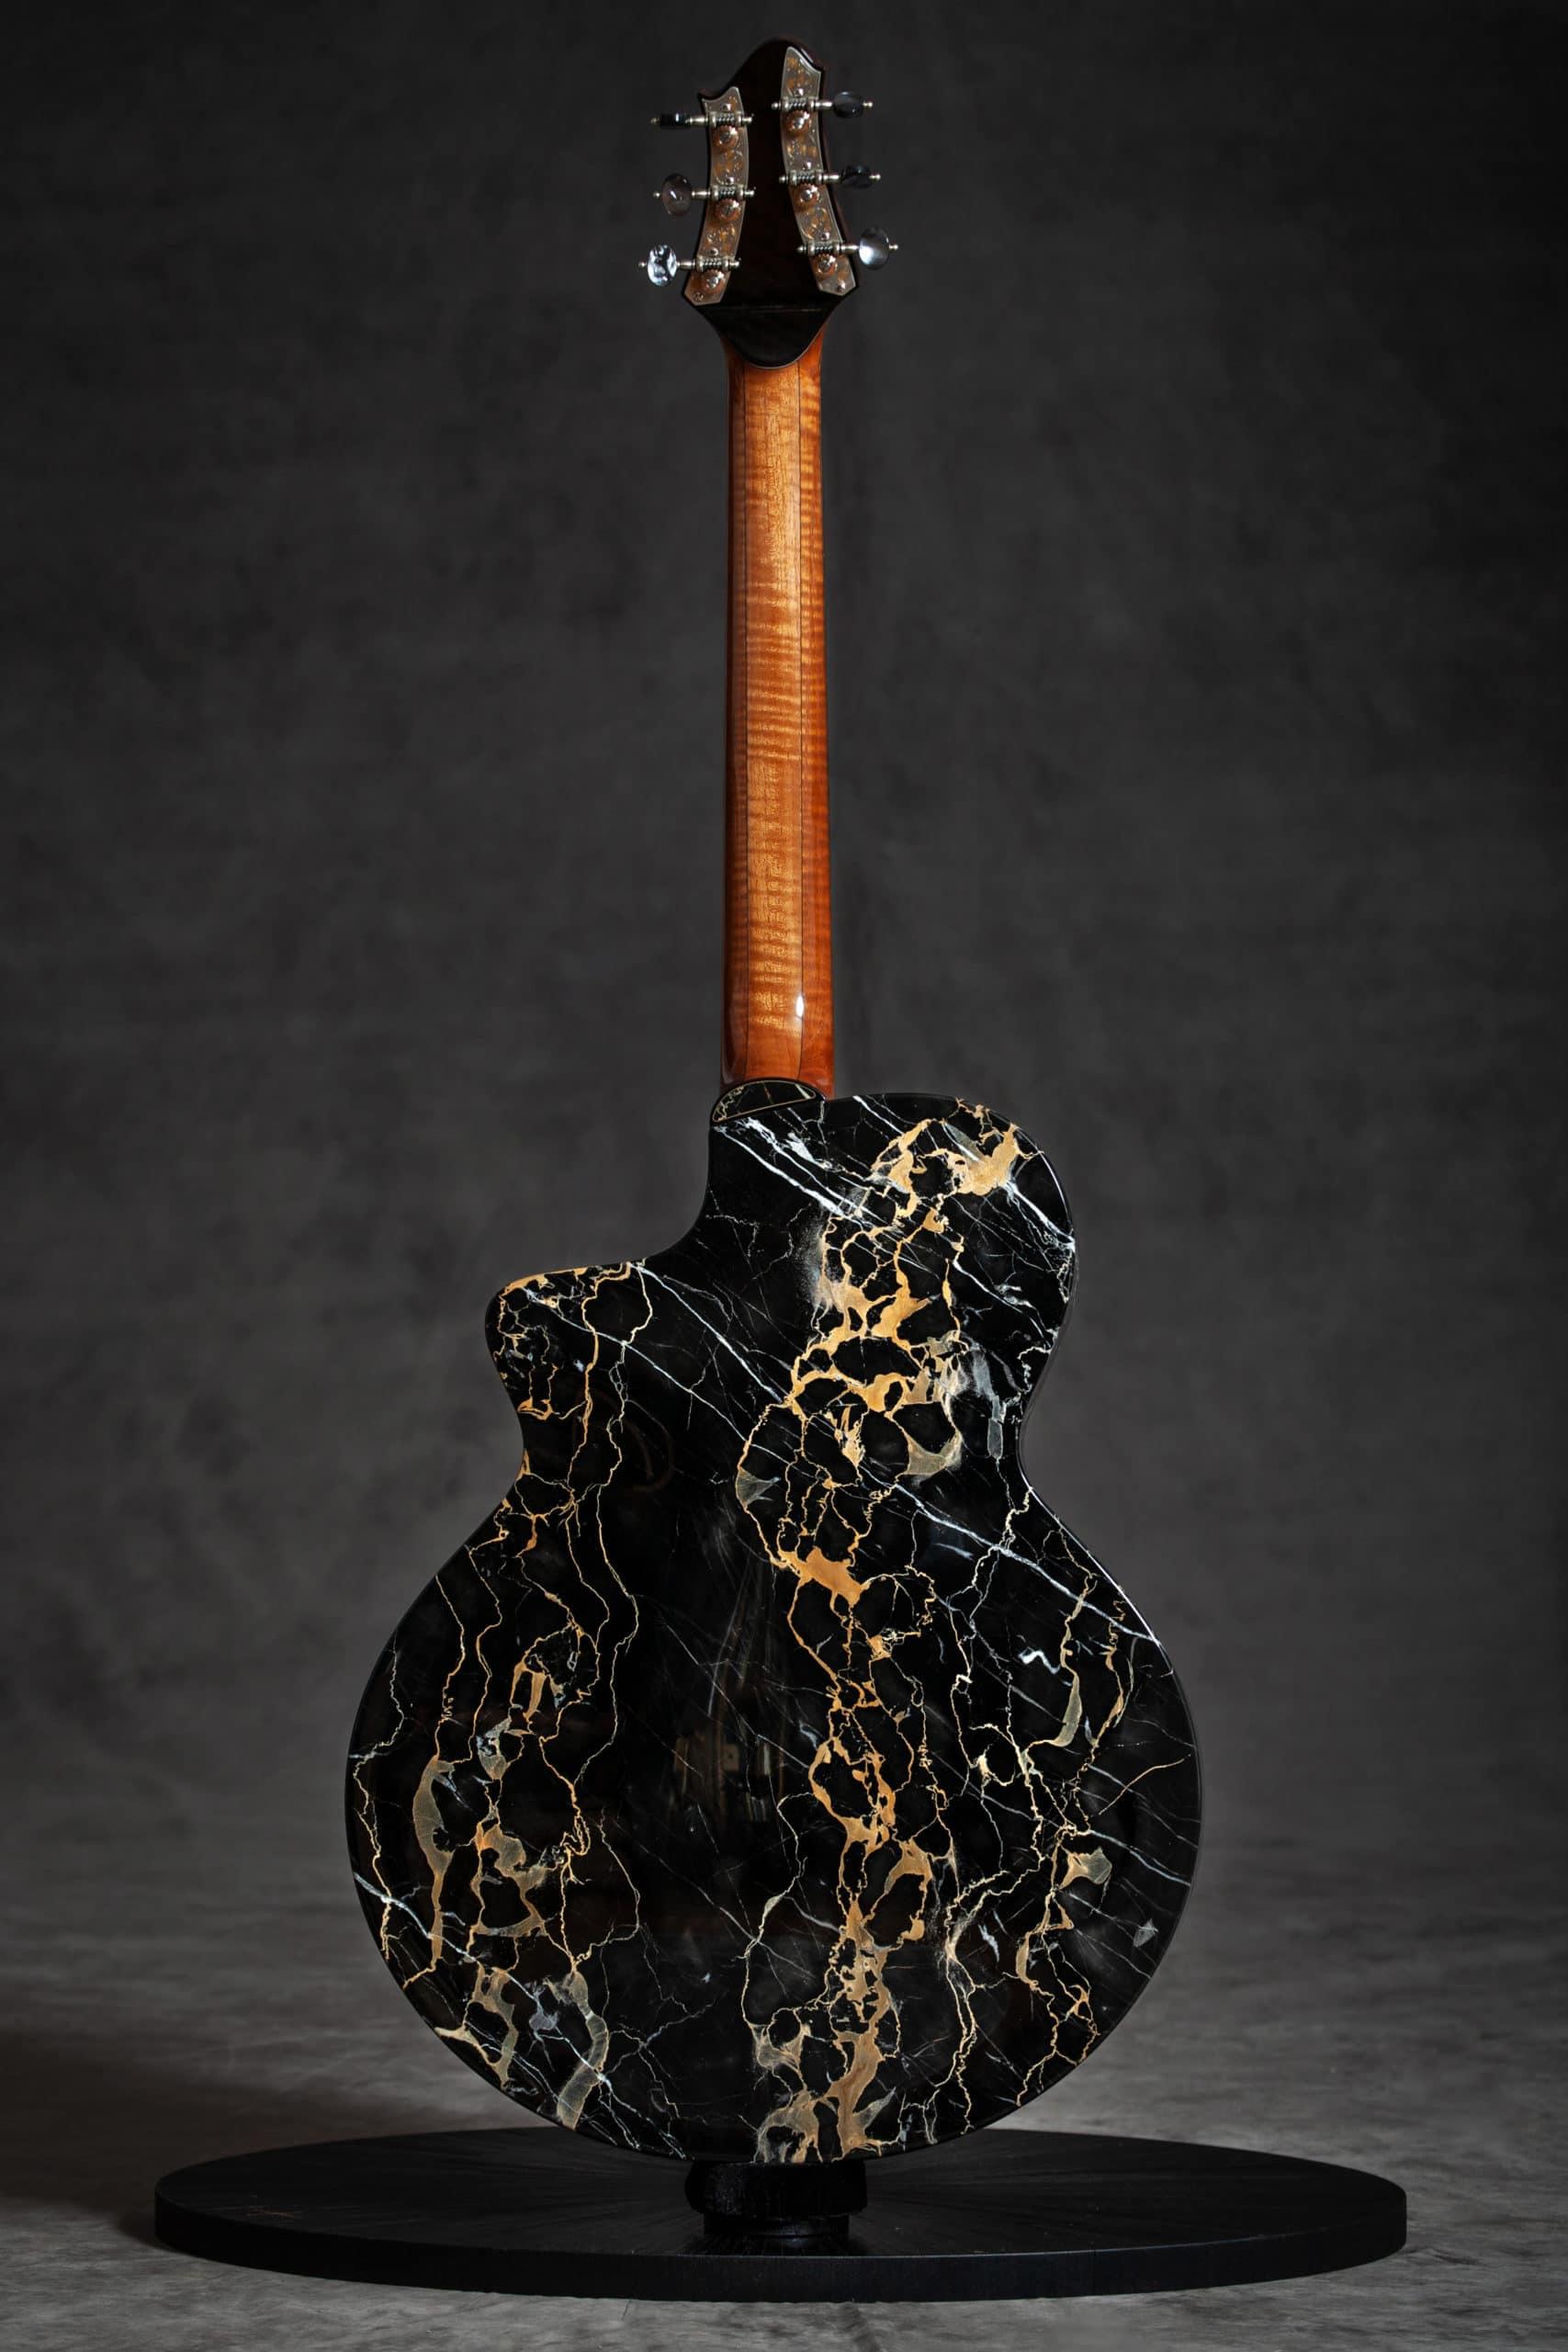 luxury guitar